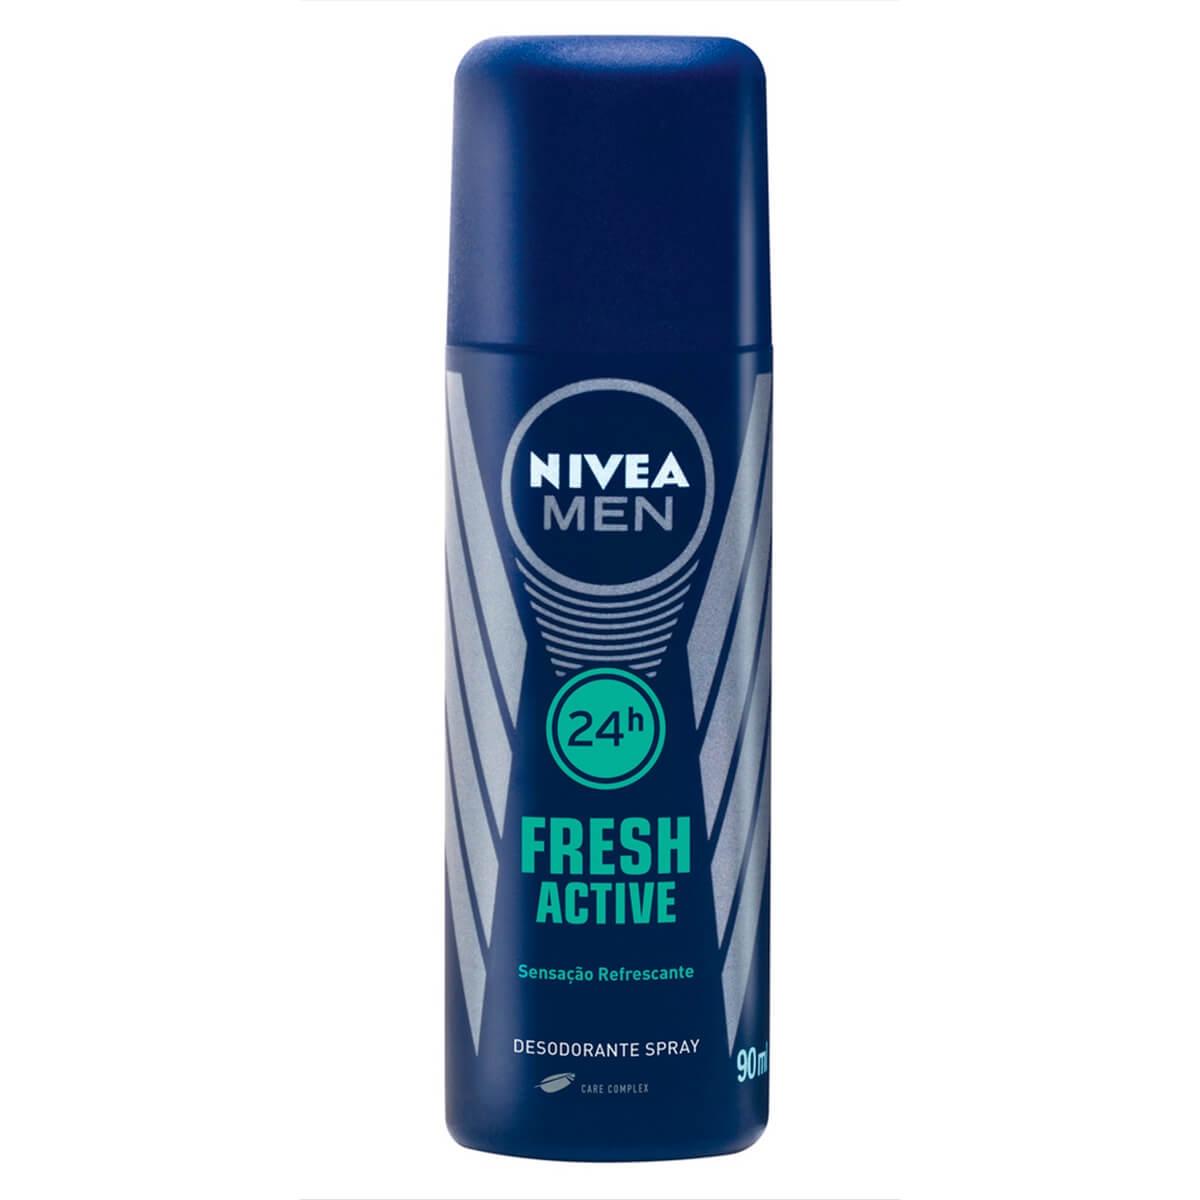 Desodorante Aerosol Nivea Men Fresh Active com 90ml 90ml